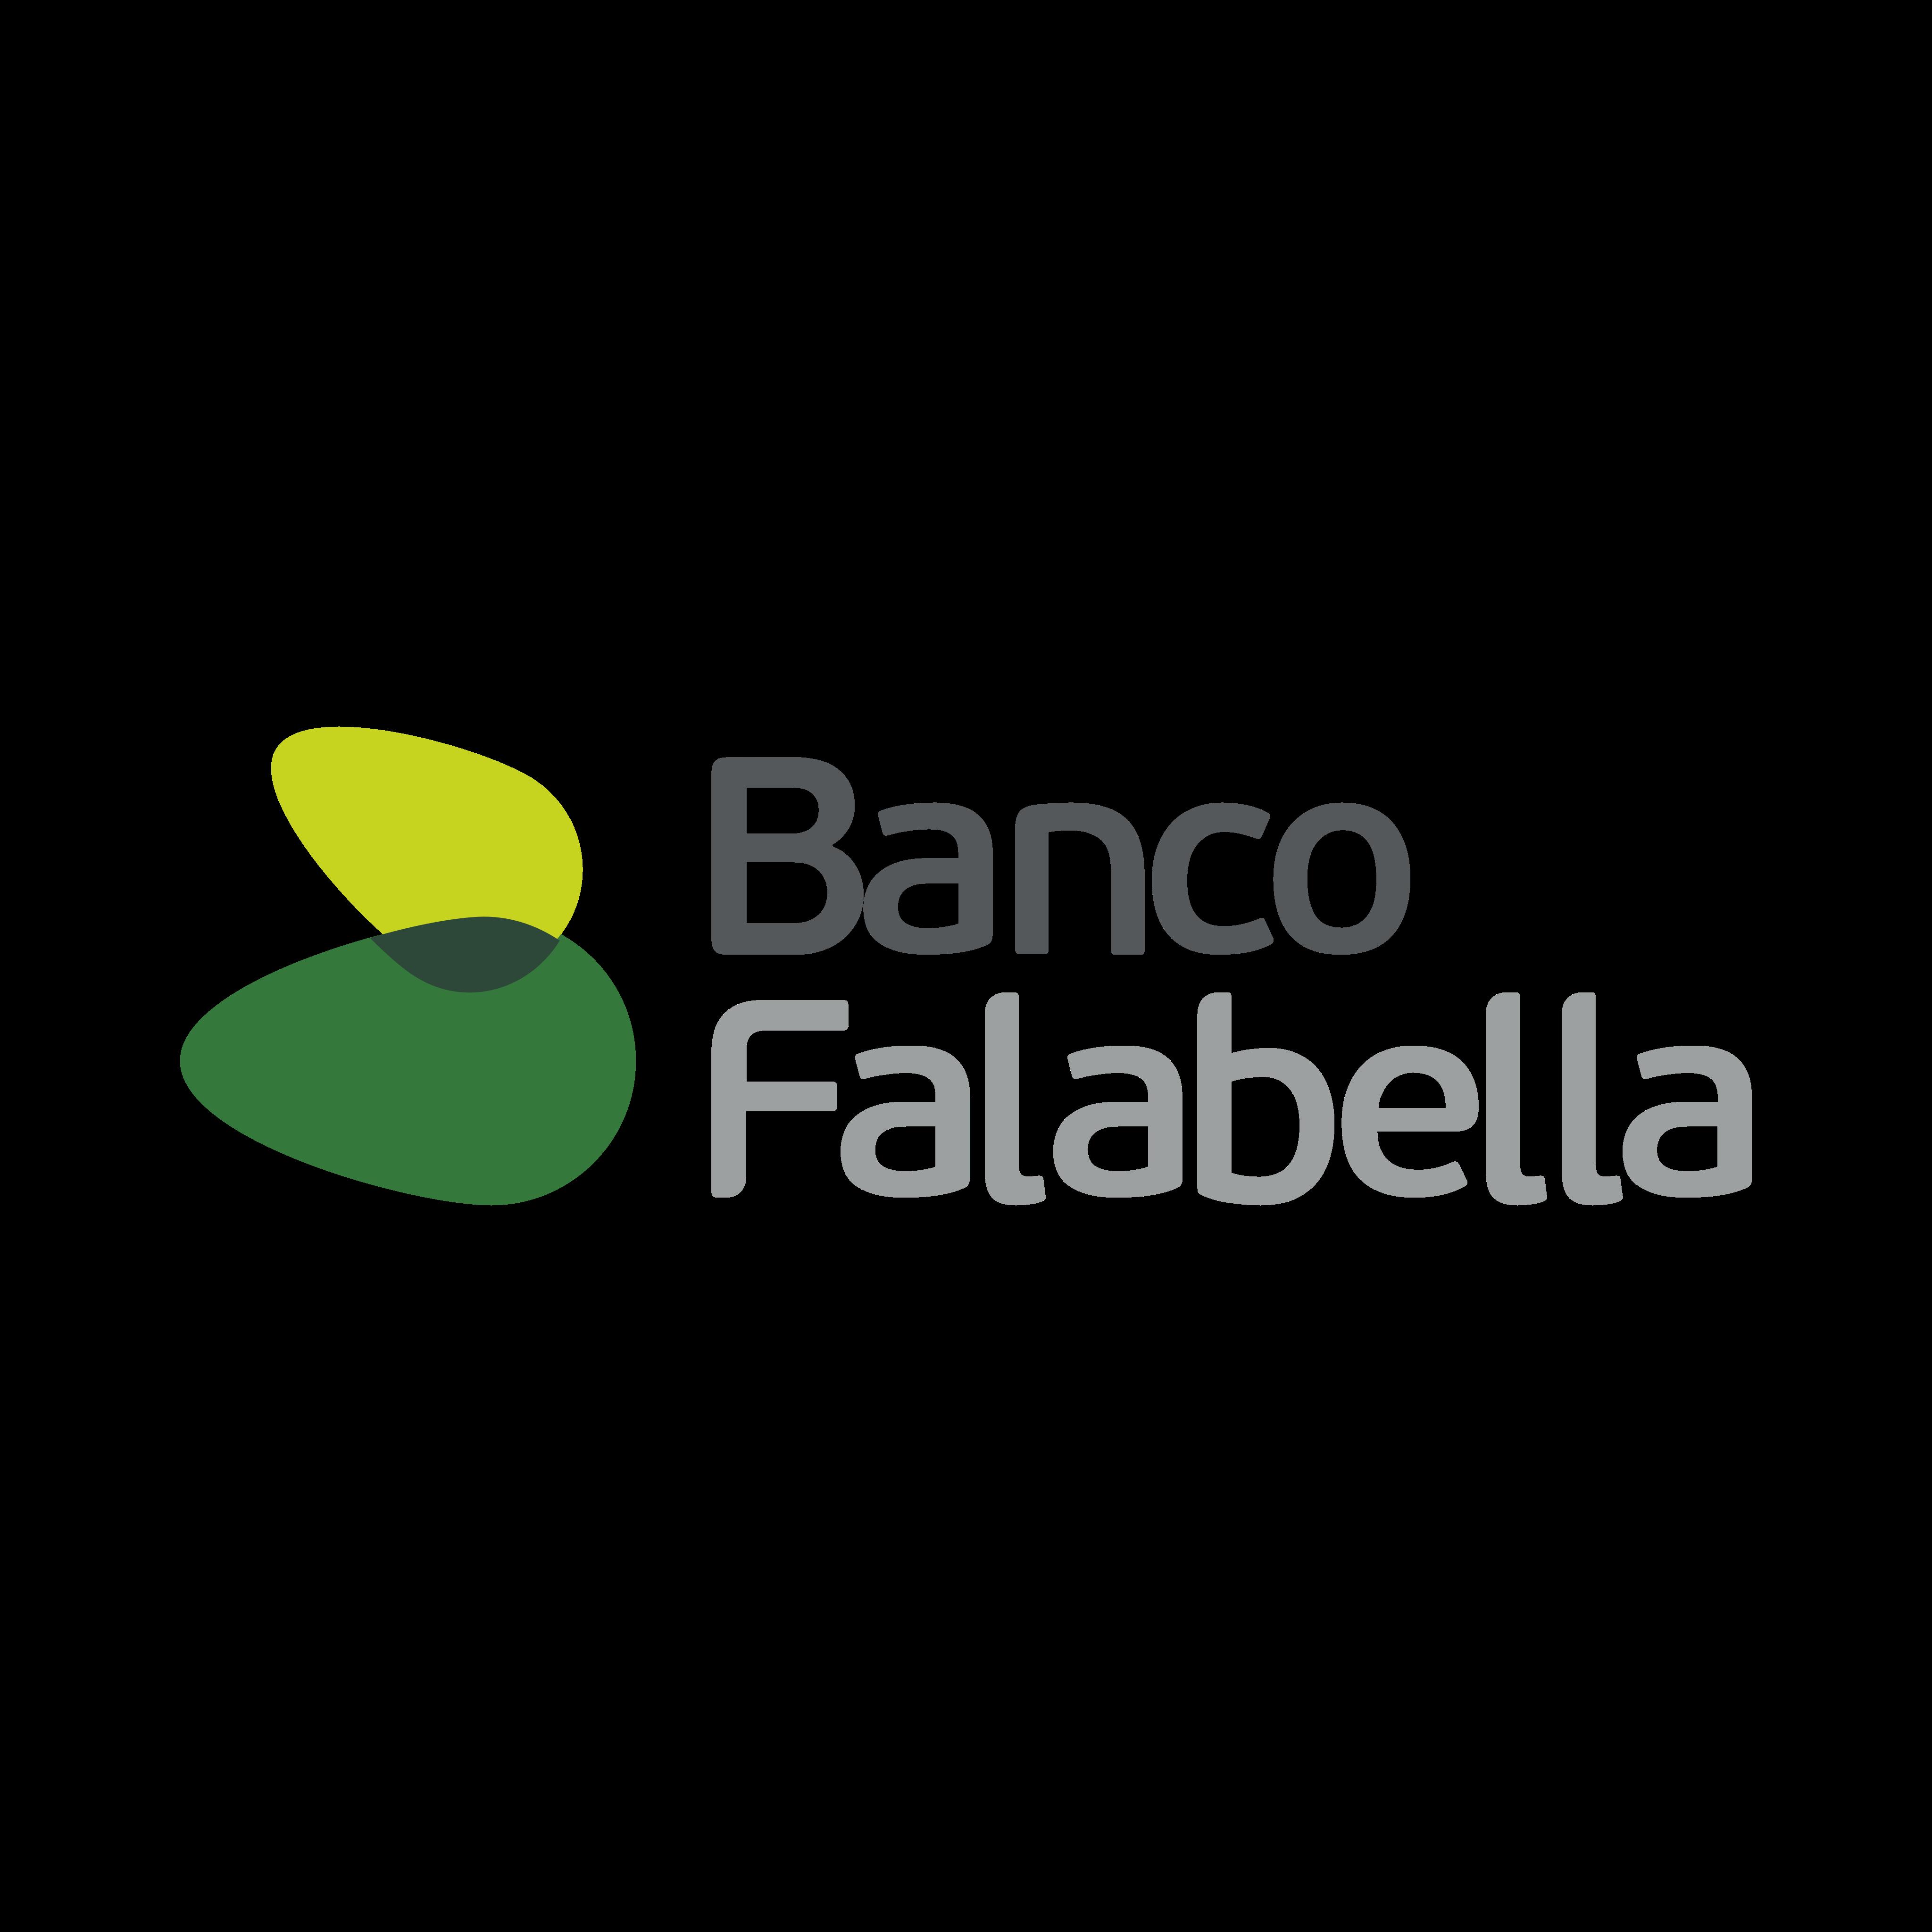 banco falabella logo 0 - Banco Falabella Logo